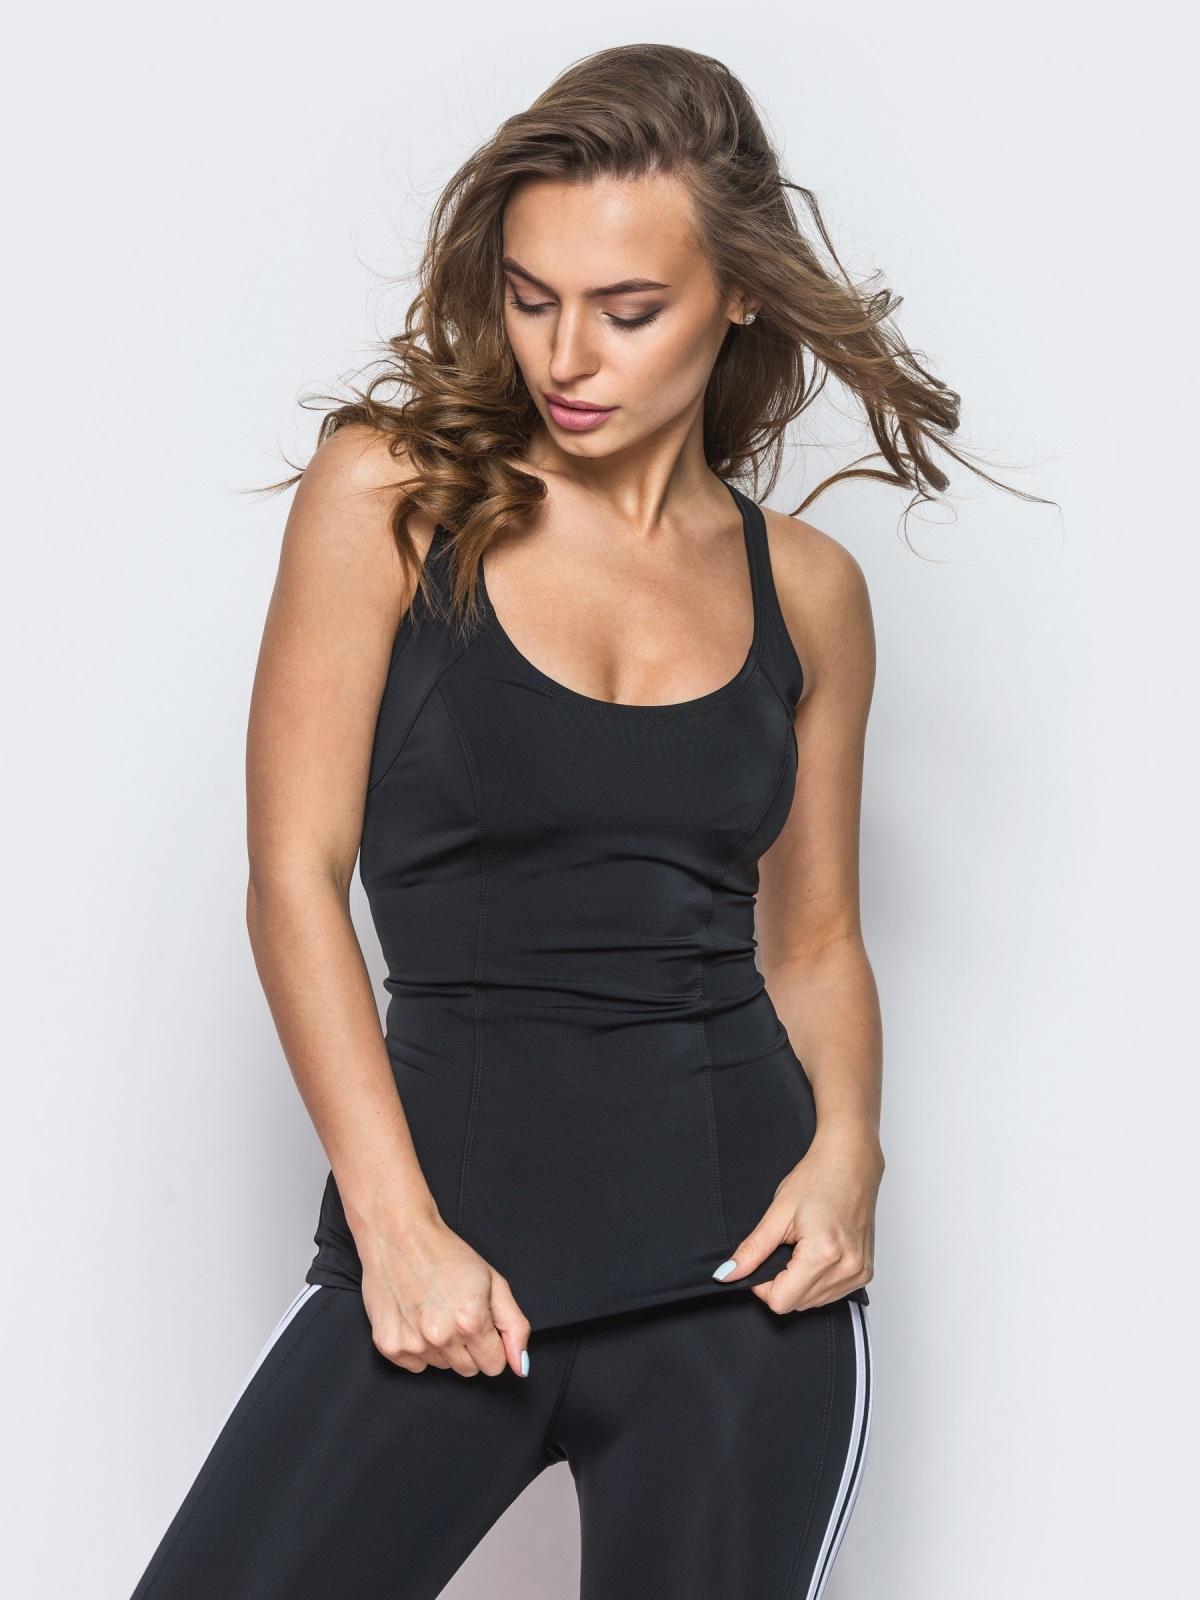 Спортивная майка без рукавов черная - 10682, фото 1 – интернет-магазин Dressa